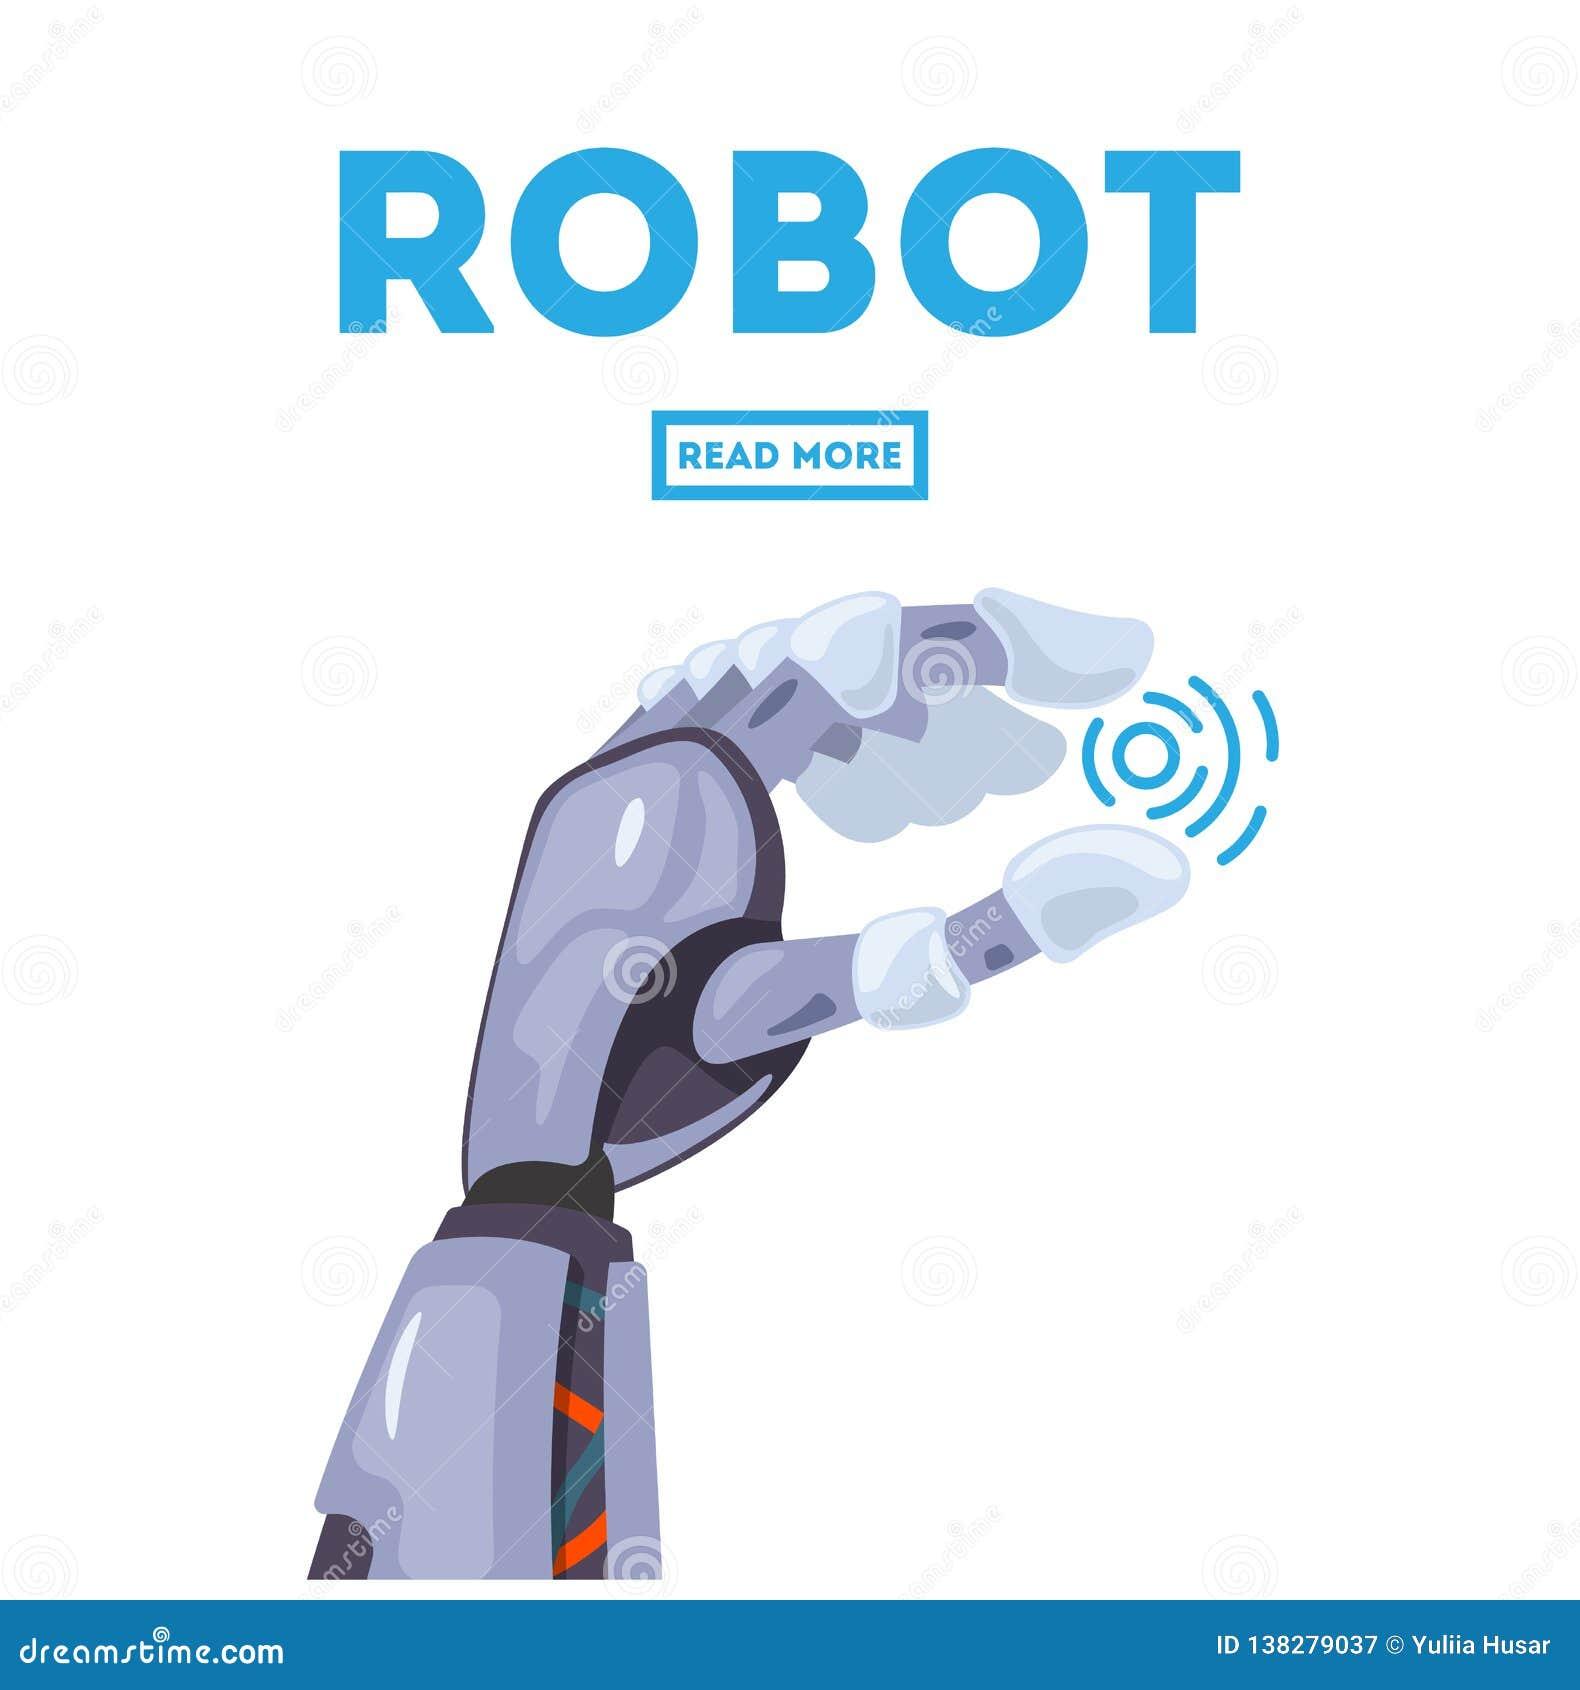 Futuristic design concept of a robotic mechanical arm. Robotic hand. Mechanical technology machine engineering symbol.